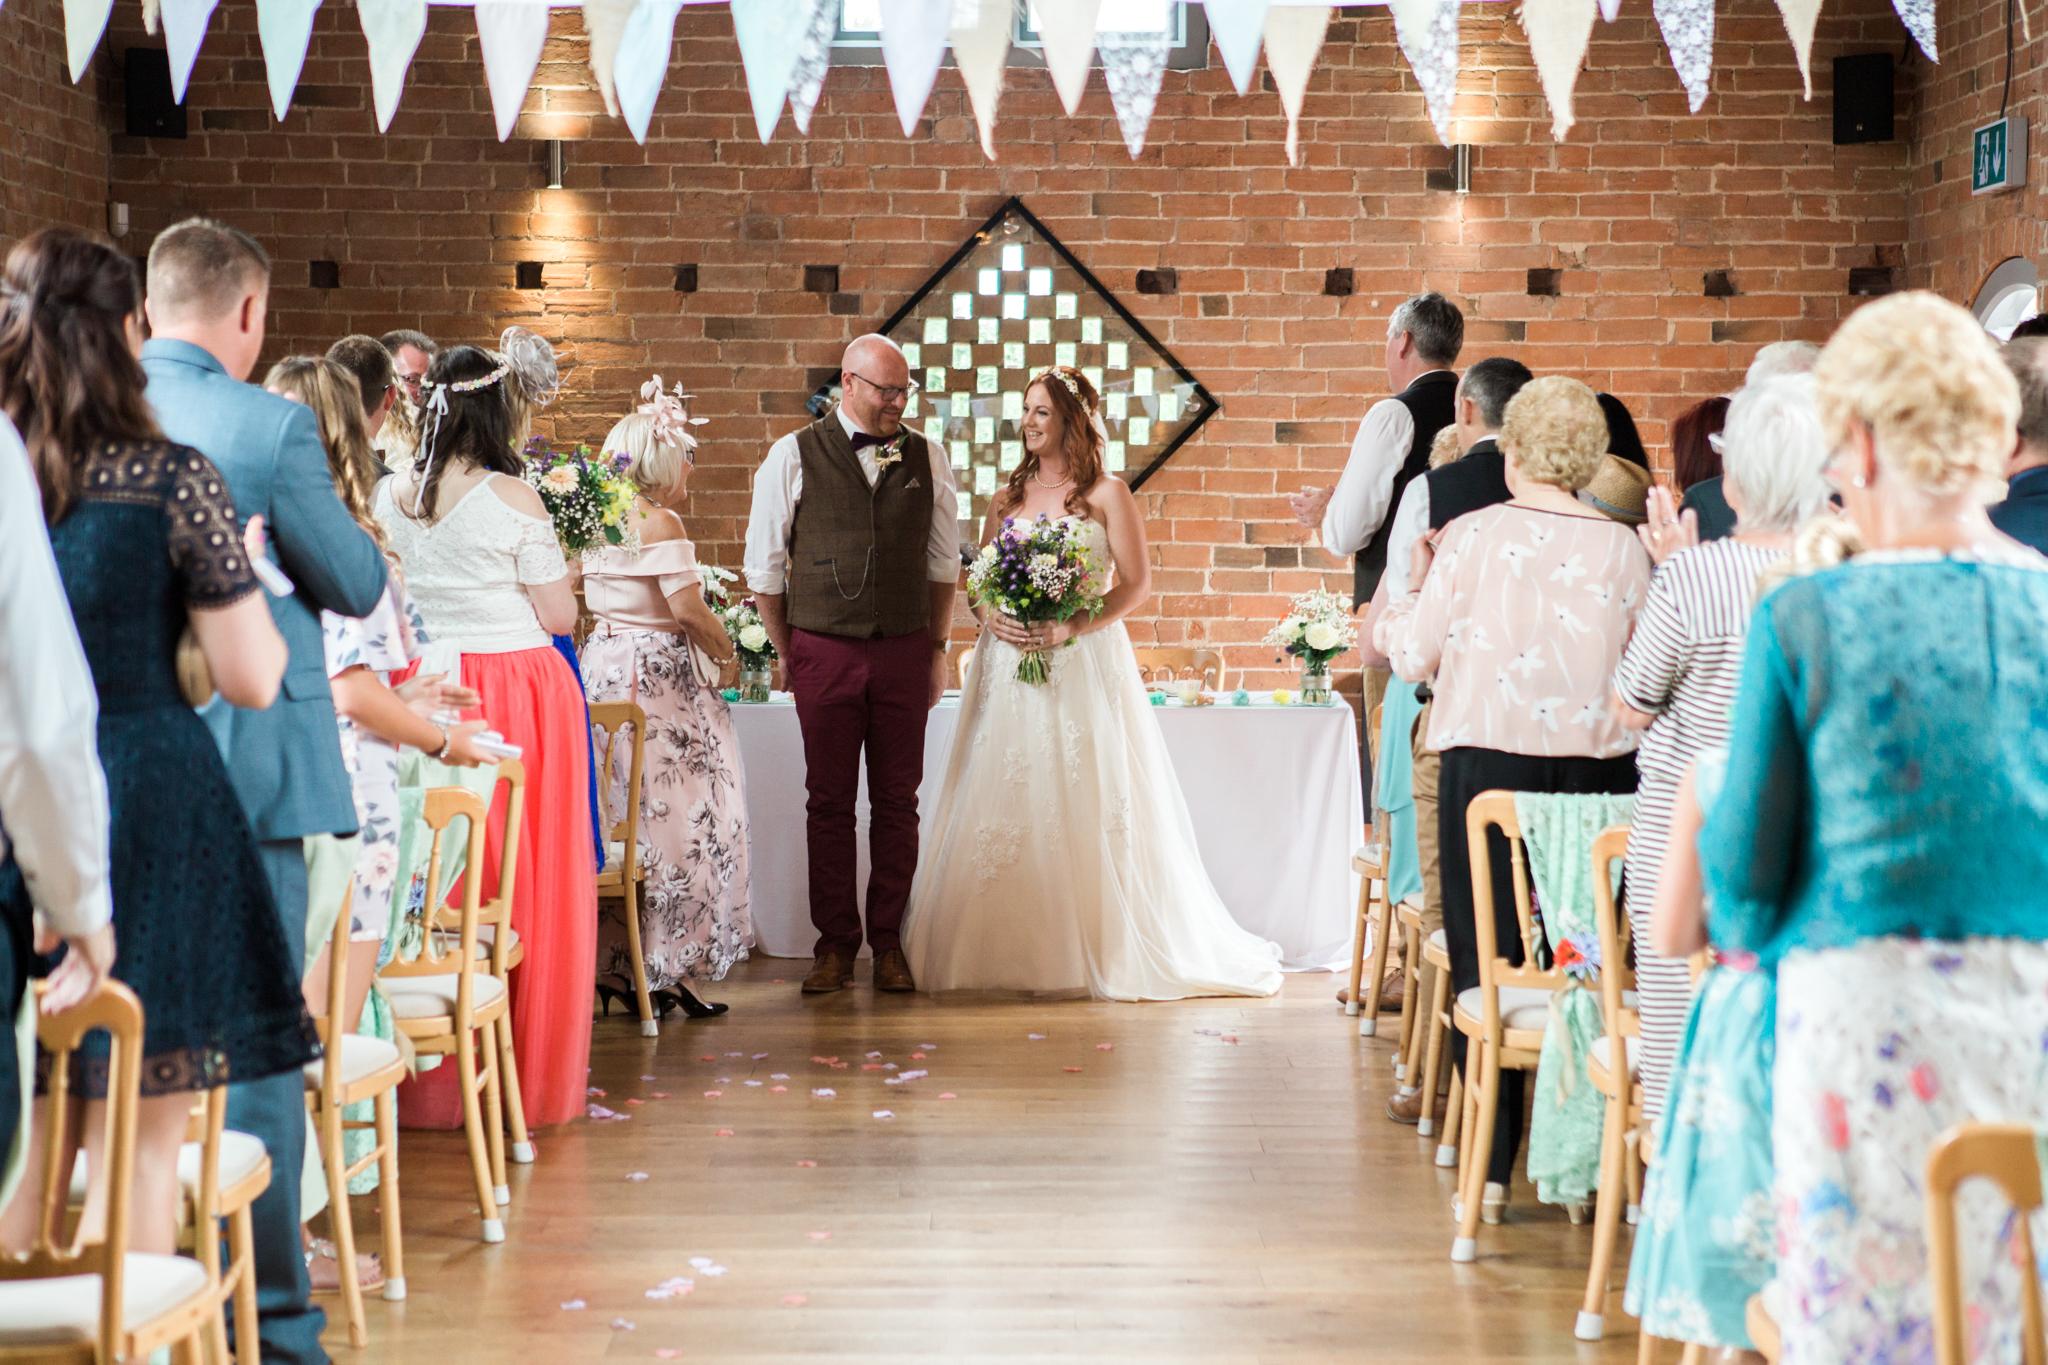 Rowsie & Lee, Swallows Nest Barn Wedding, Cotswold wedding photographer, Warwickshire Wedding Photographer-55.jpg